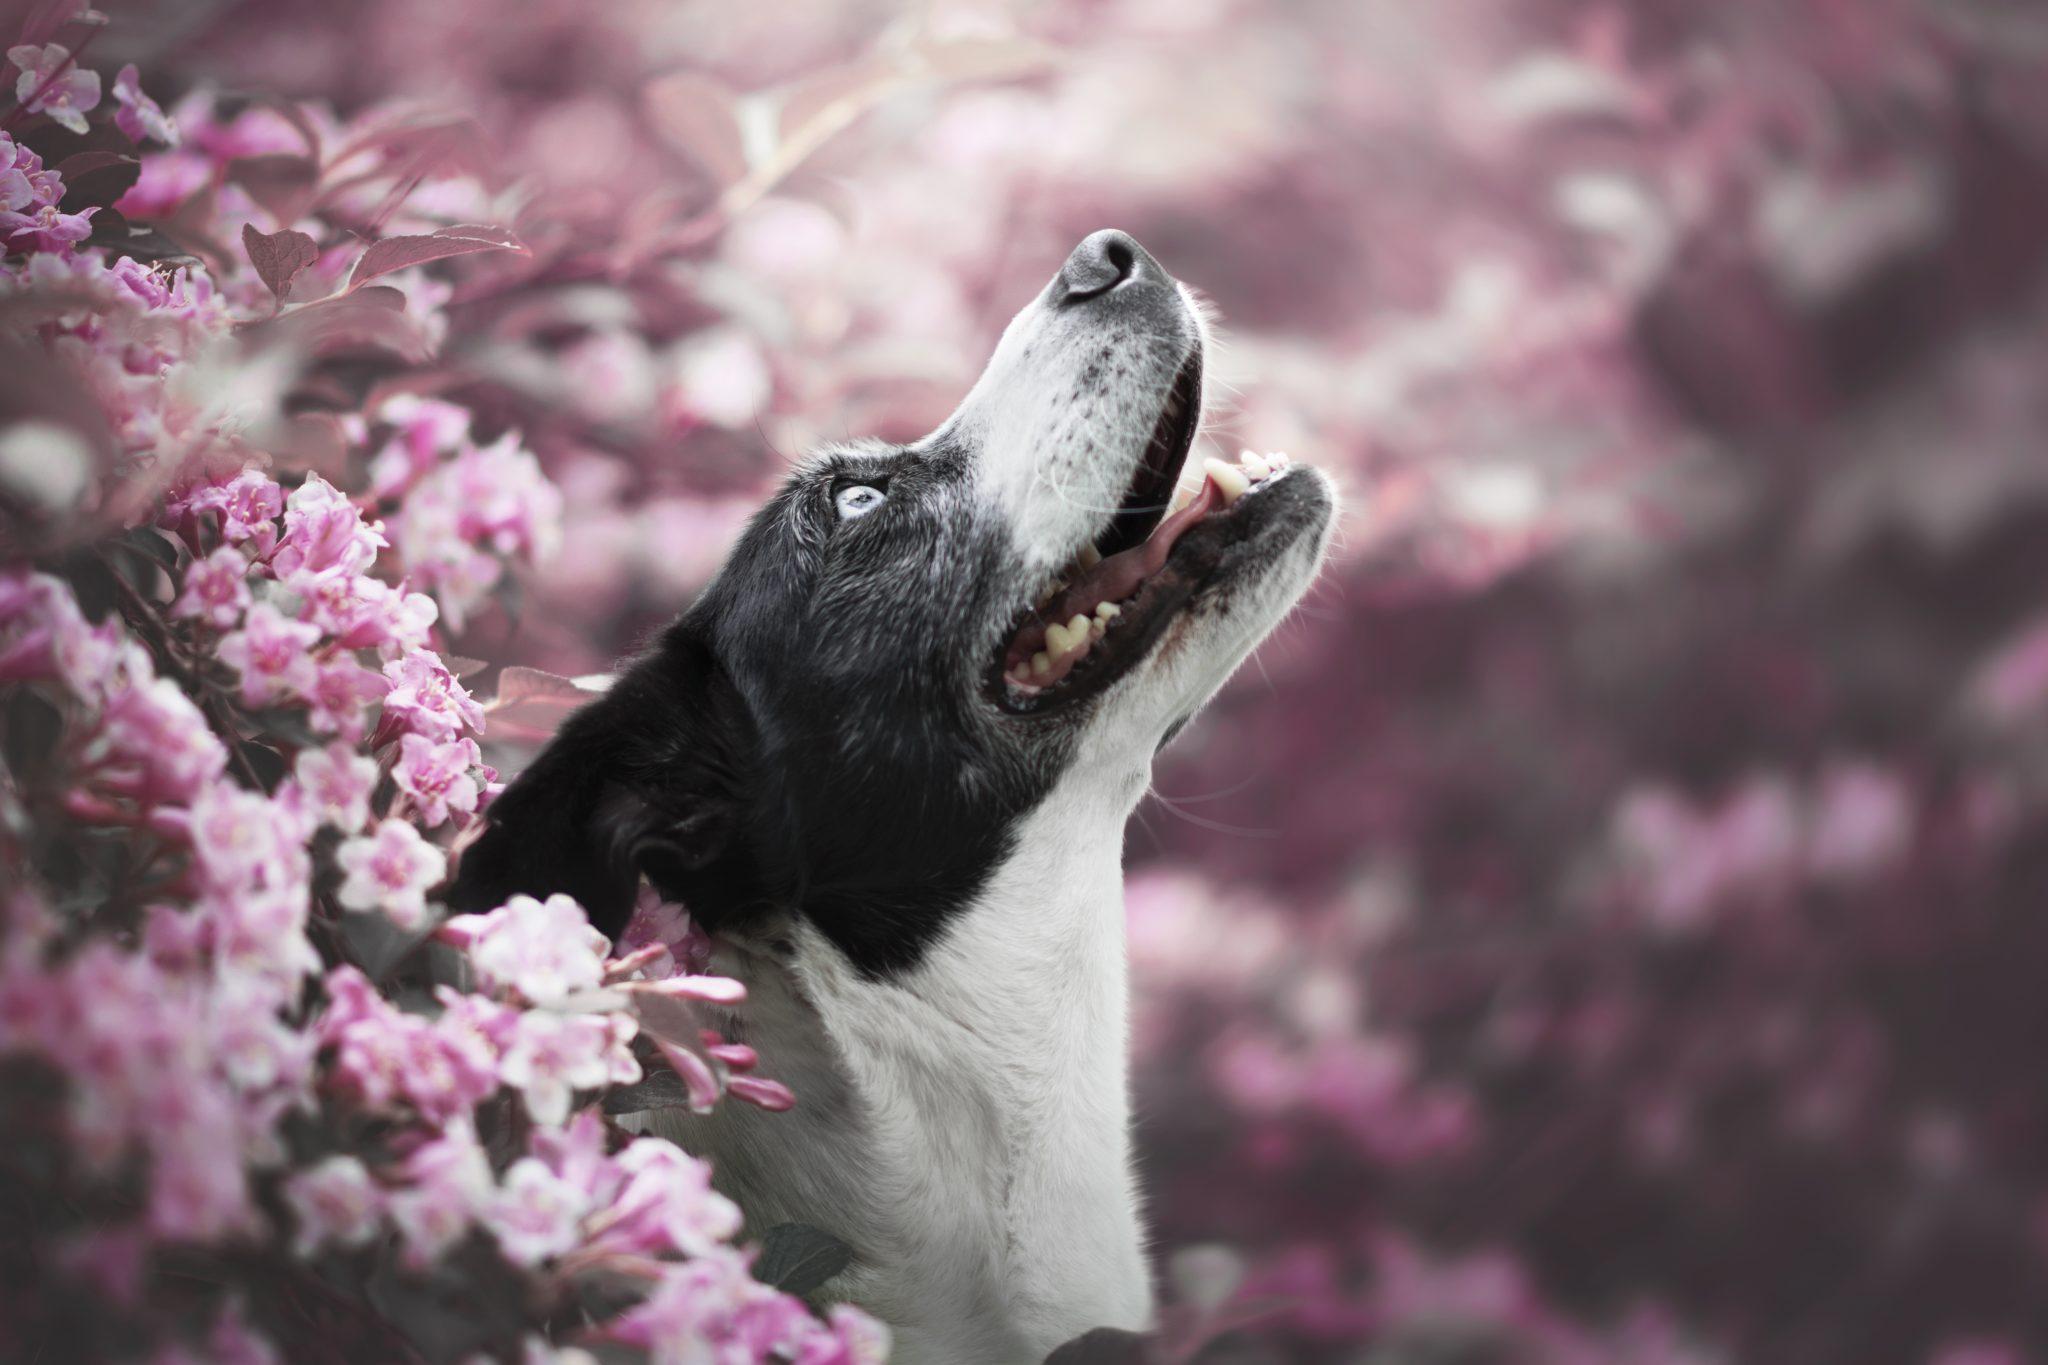 Chien photographe canin portrait cani look